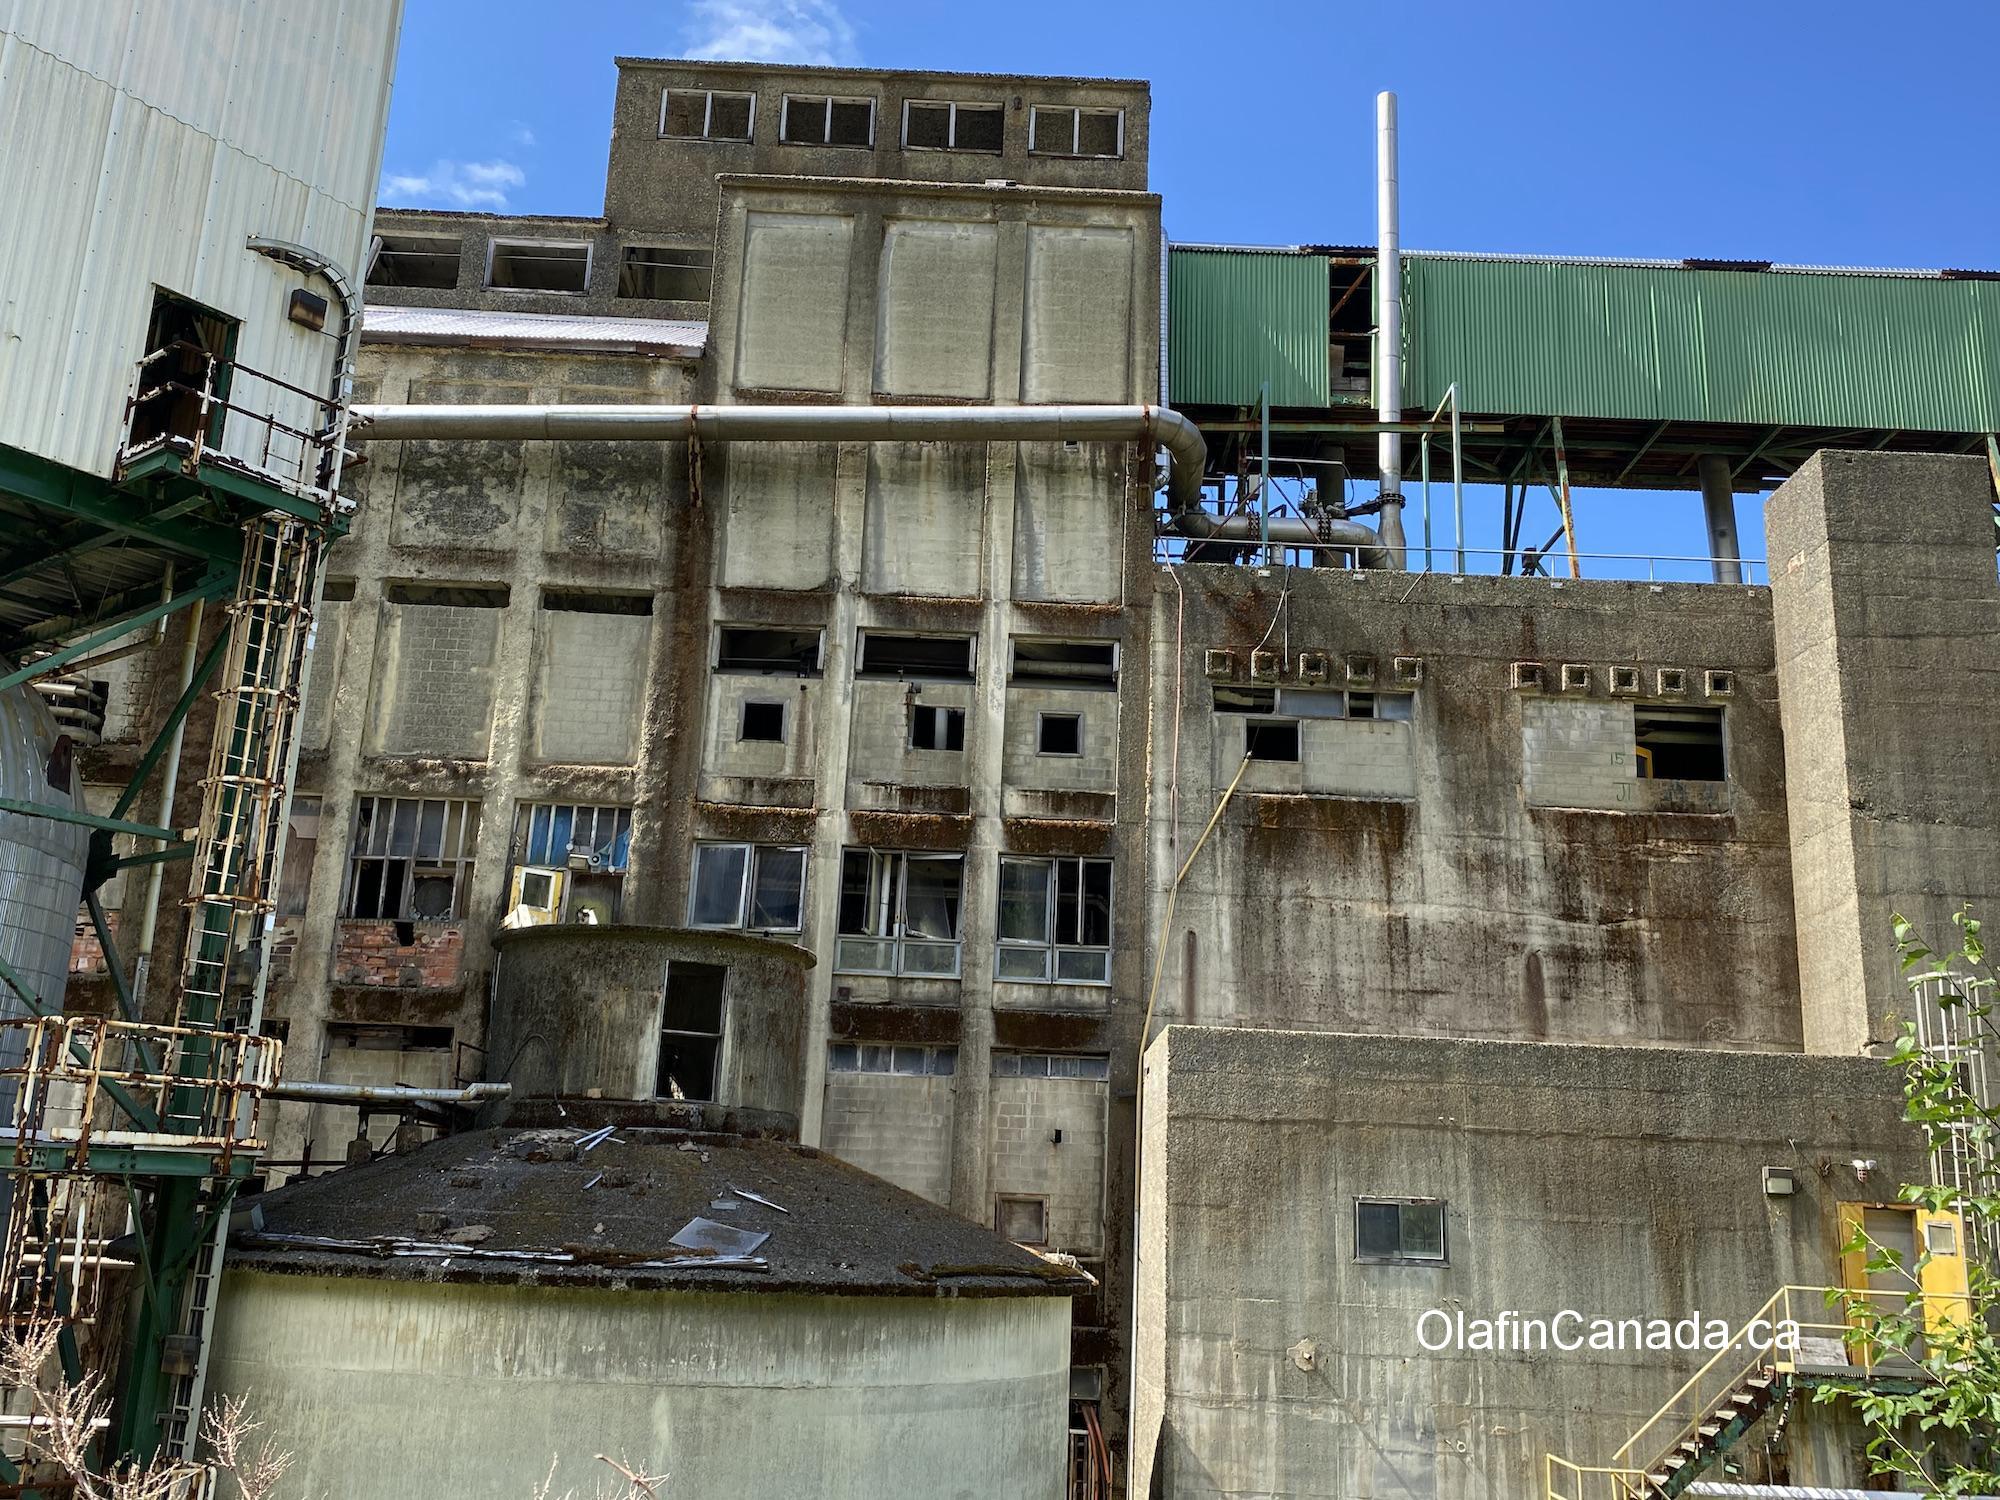 Abandoned Neucel factory in Port Alice on Vancouver Island #olafincanada #britishcolumbia #discoverbc #abandonedbc #factory